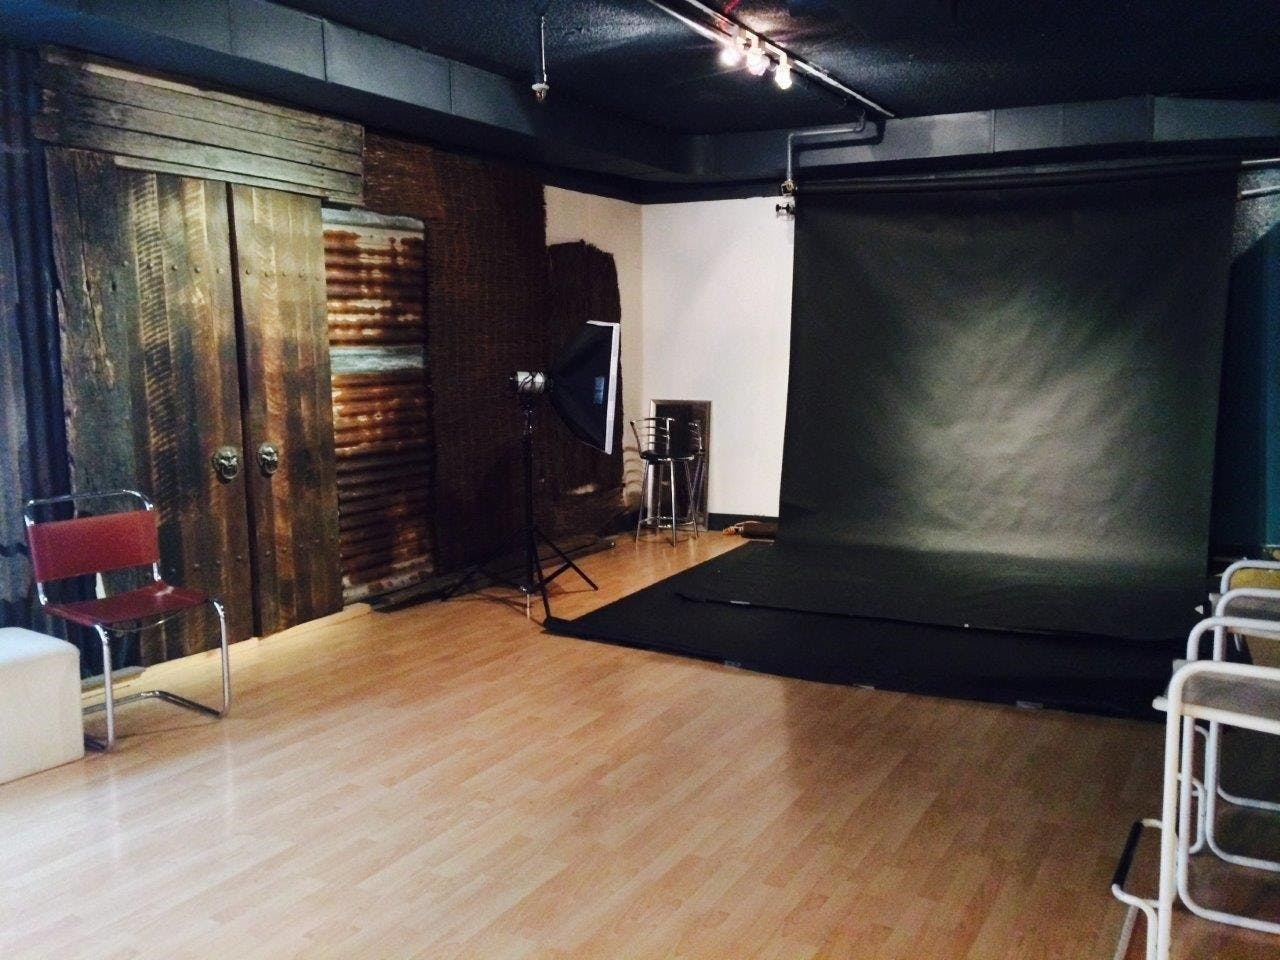 Photography Studio, creative studio at MAMM International Sydney, image 1